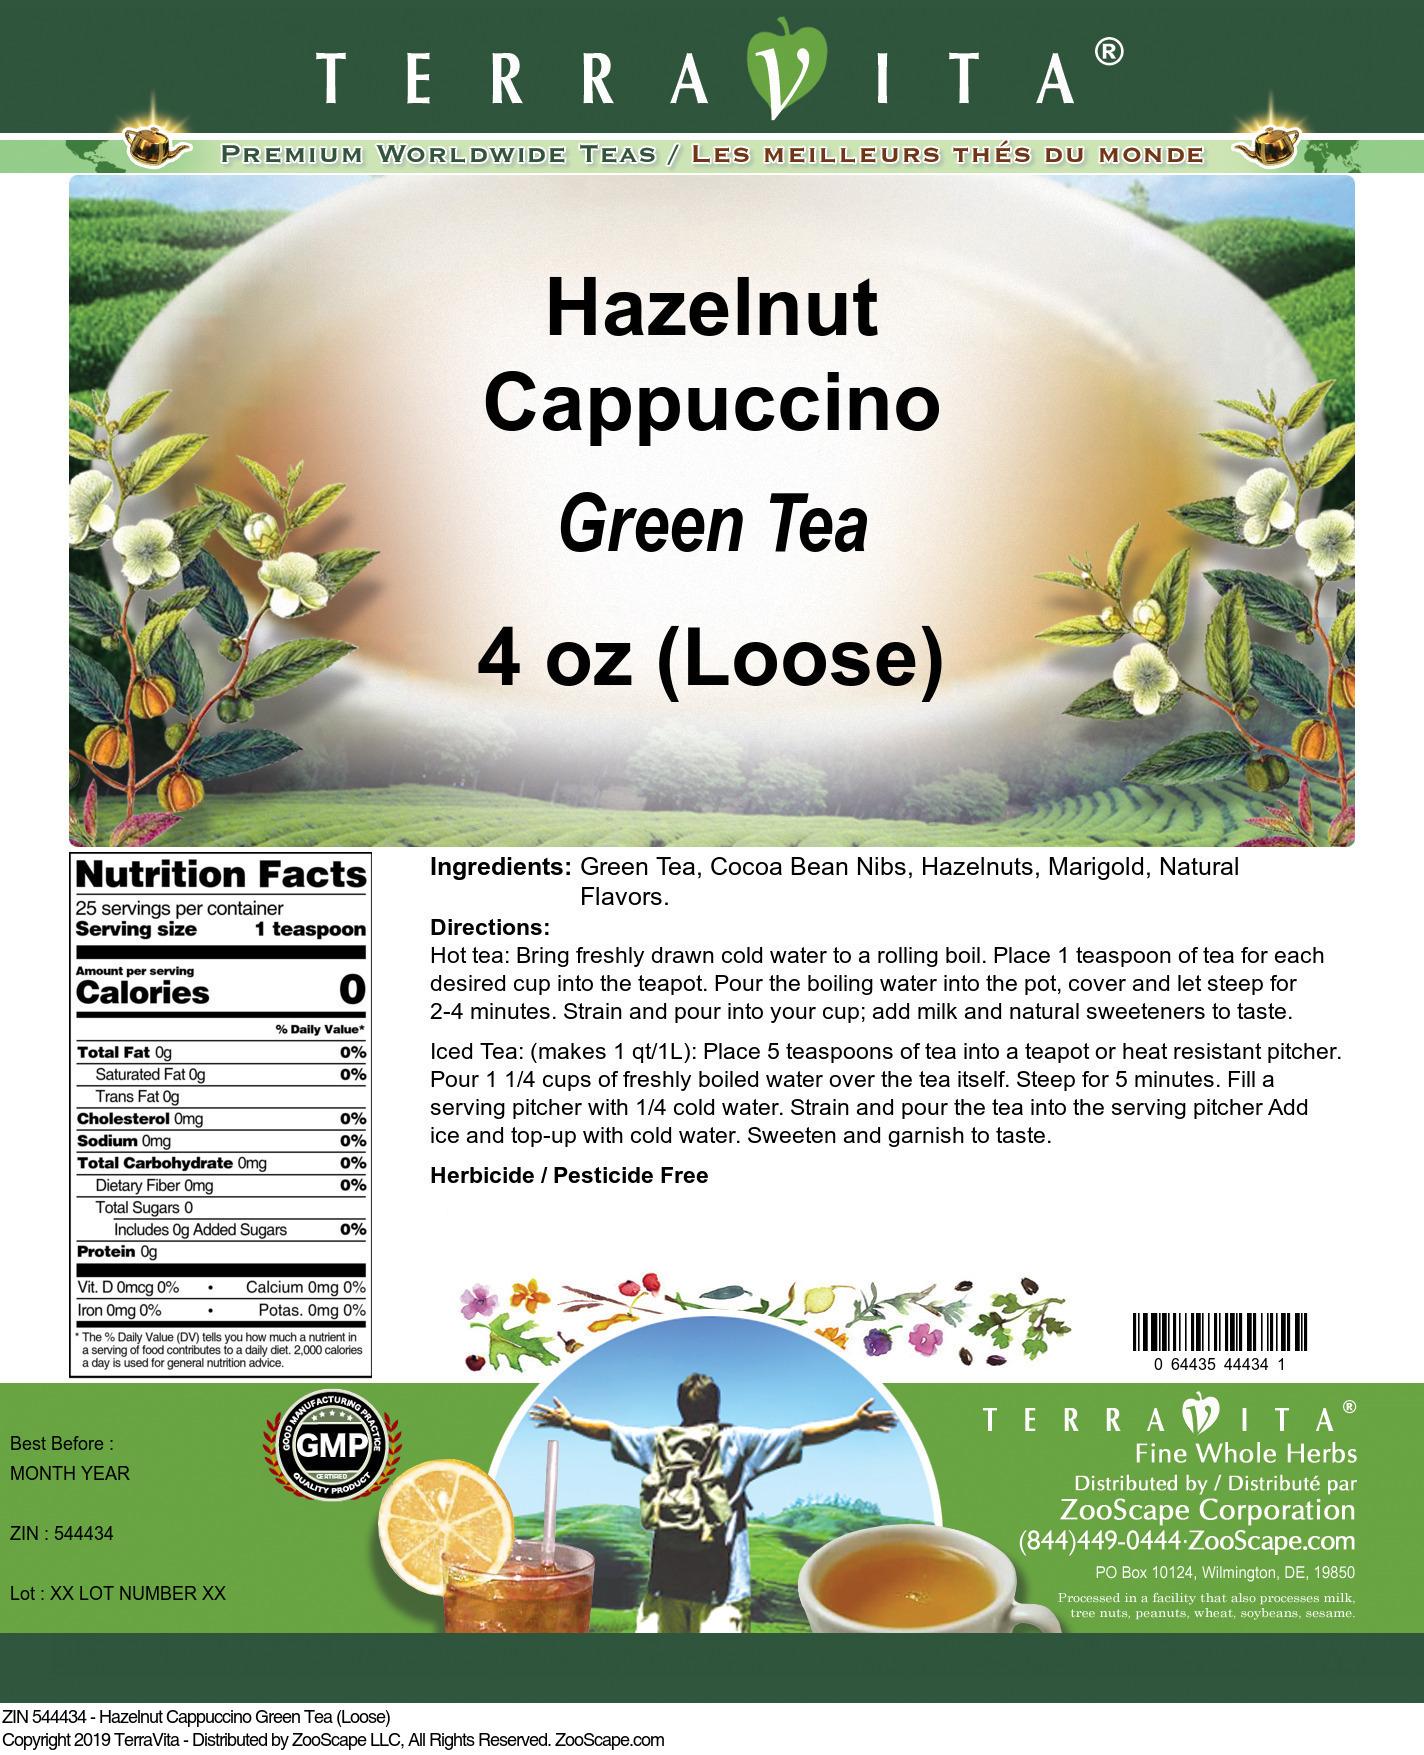 Hazelnut Cappuccino Green Tea